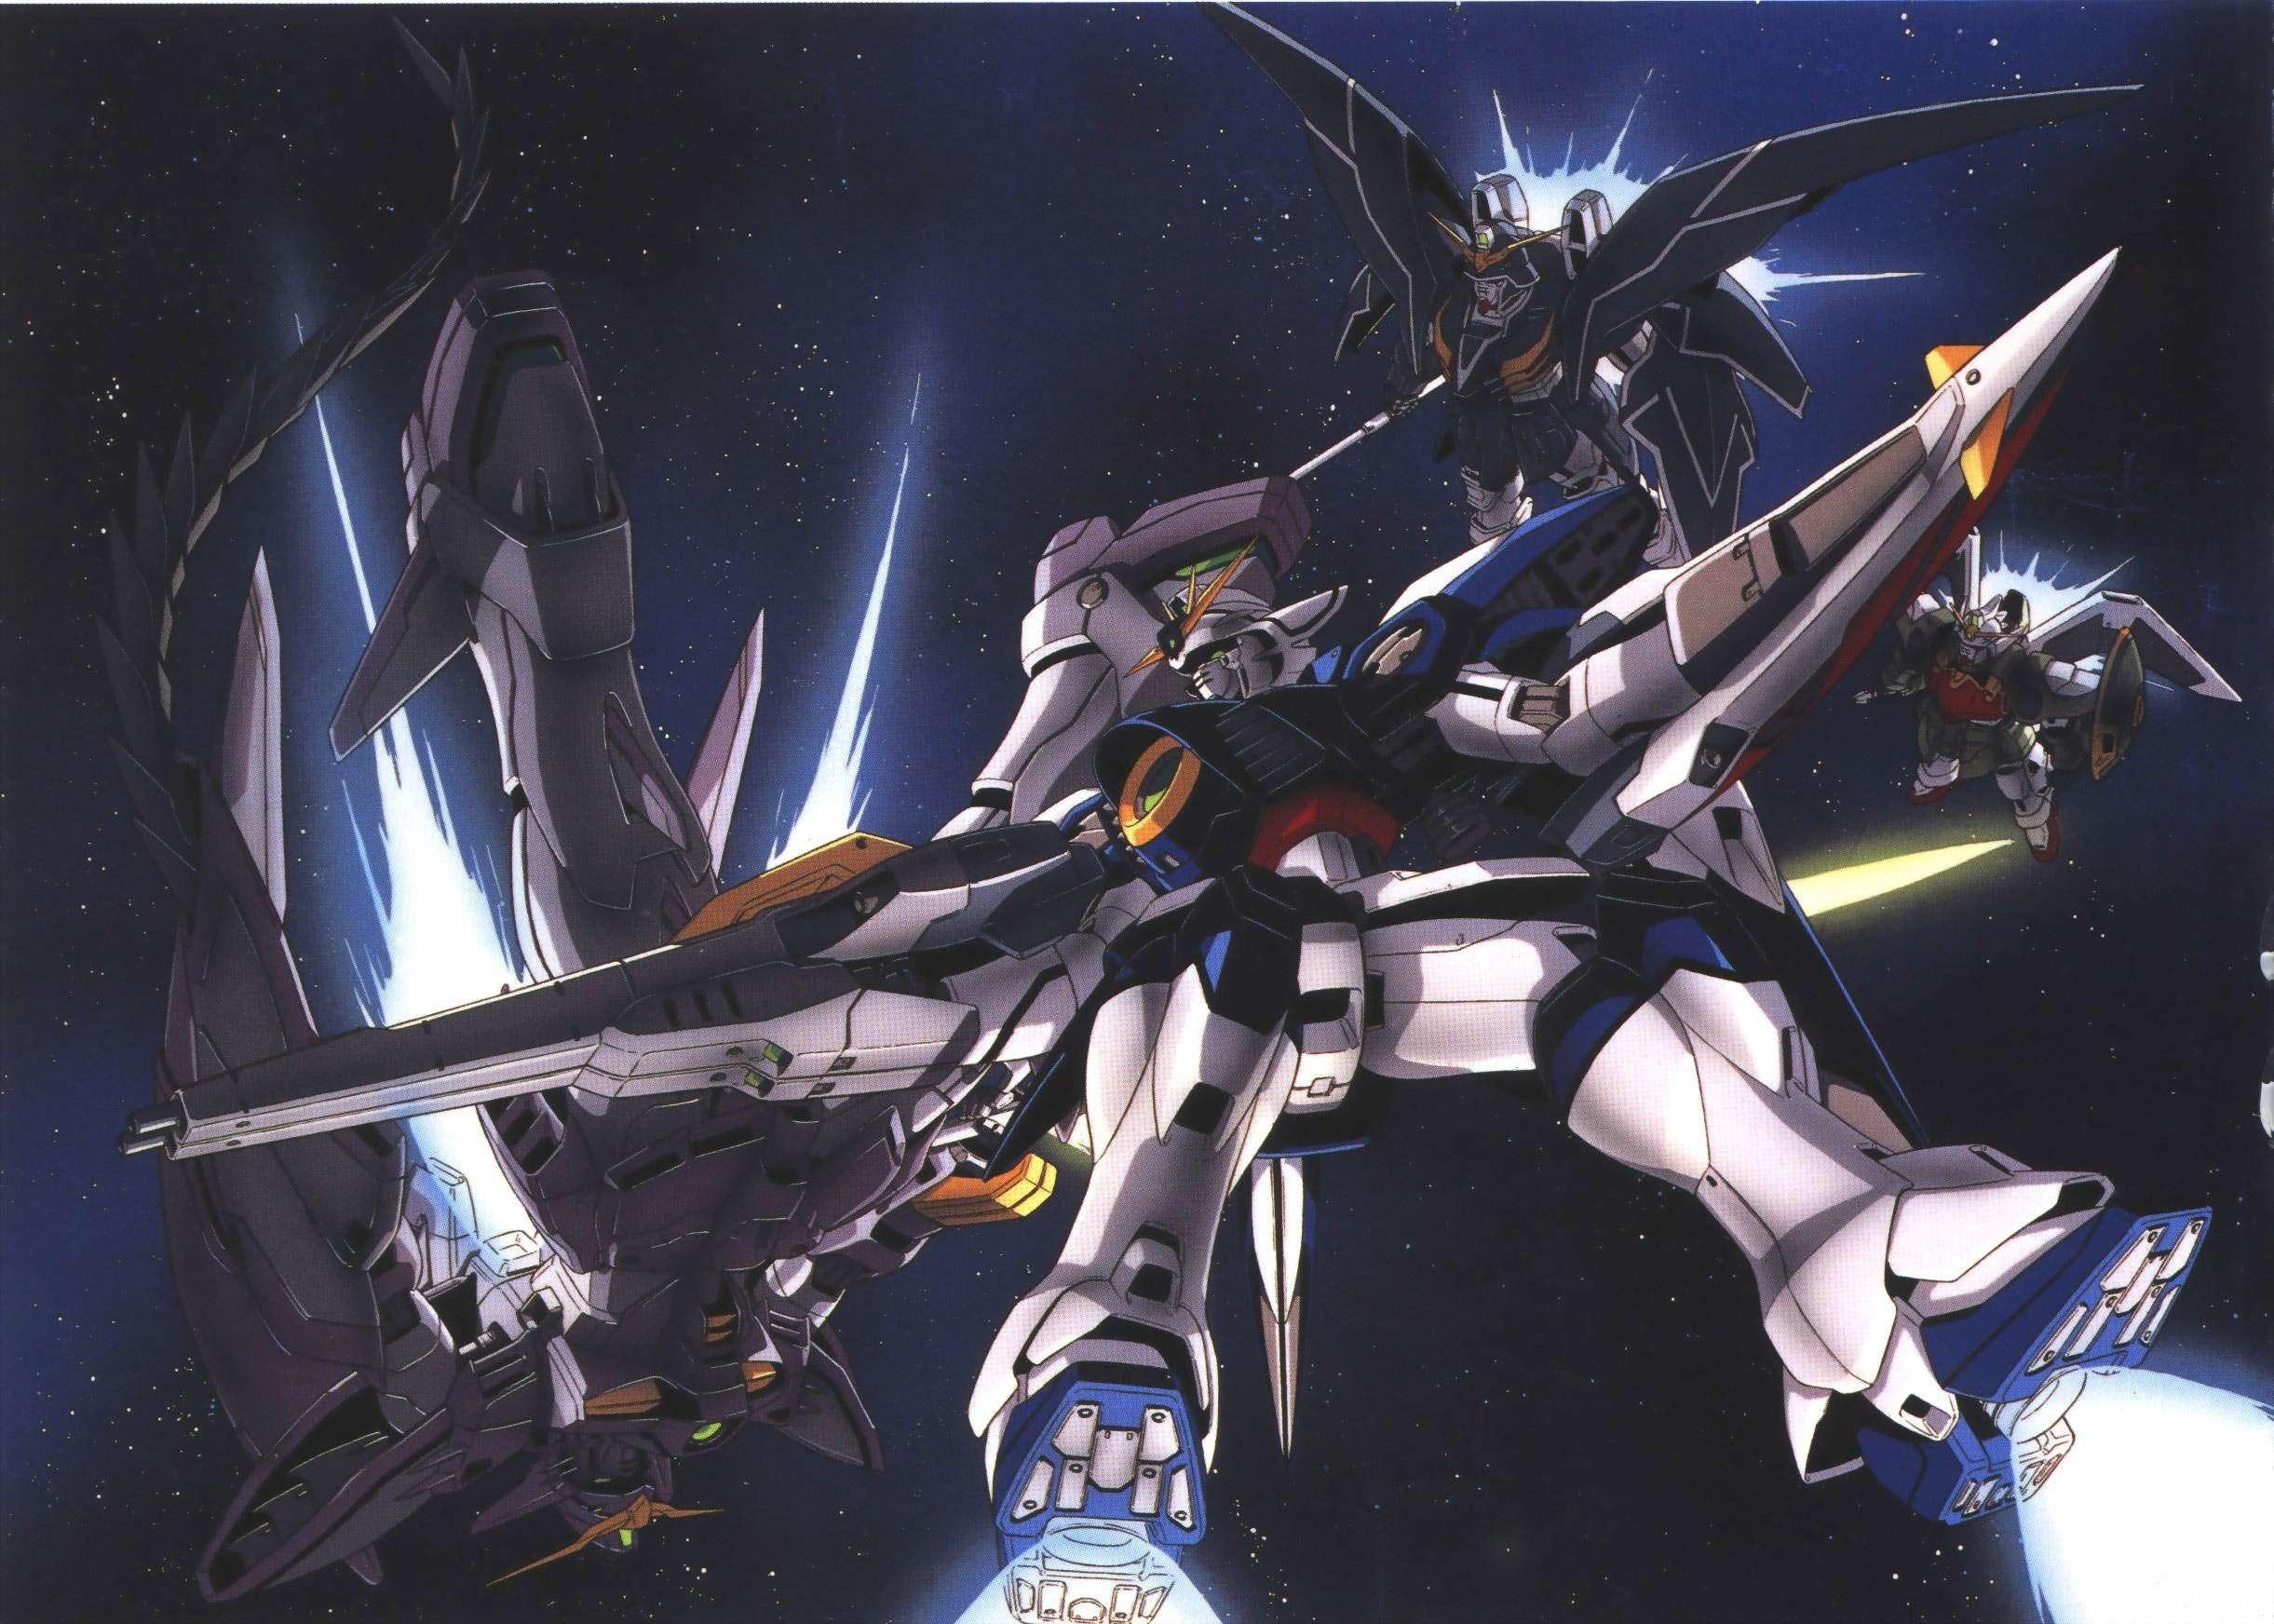 Gundam Wallpaper 1440x2560 Mywallpapers Site In 2020 Gundam Wallpapers Gundam Gundam Wing